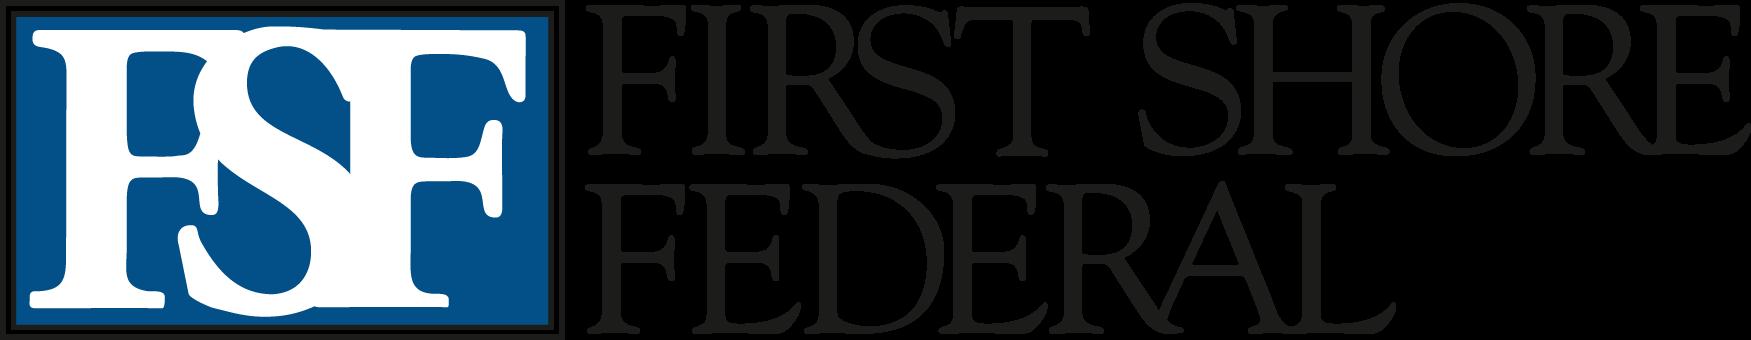 First Shore Federal Logo